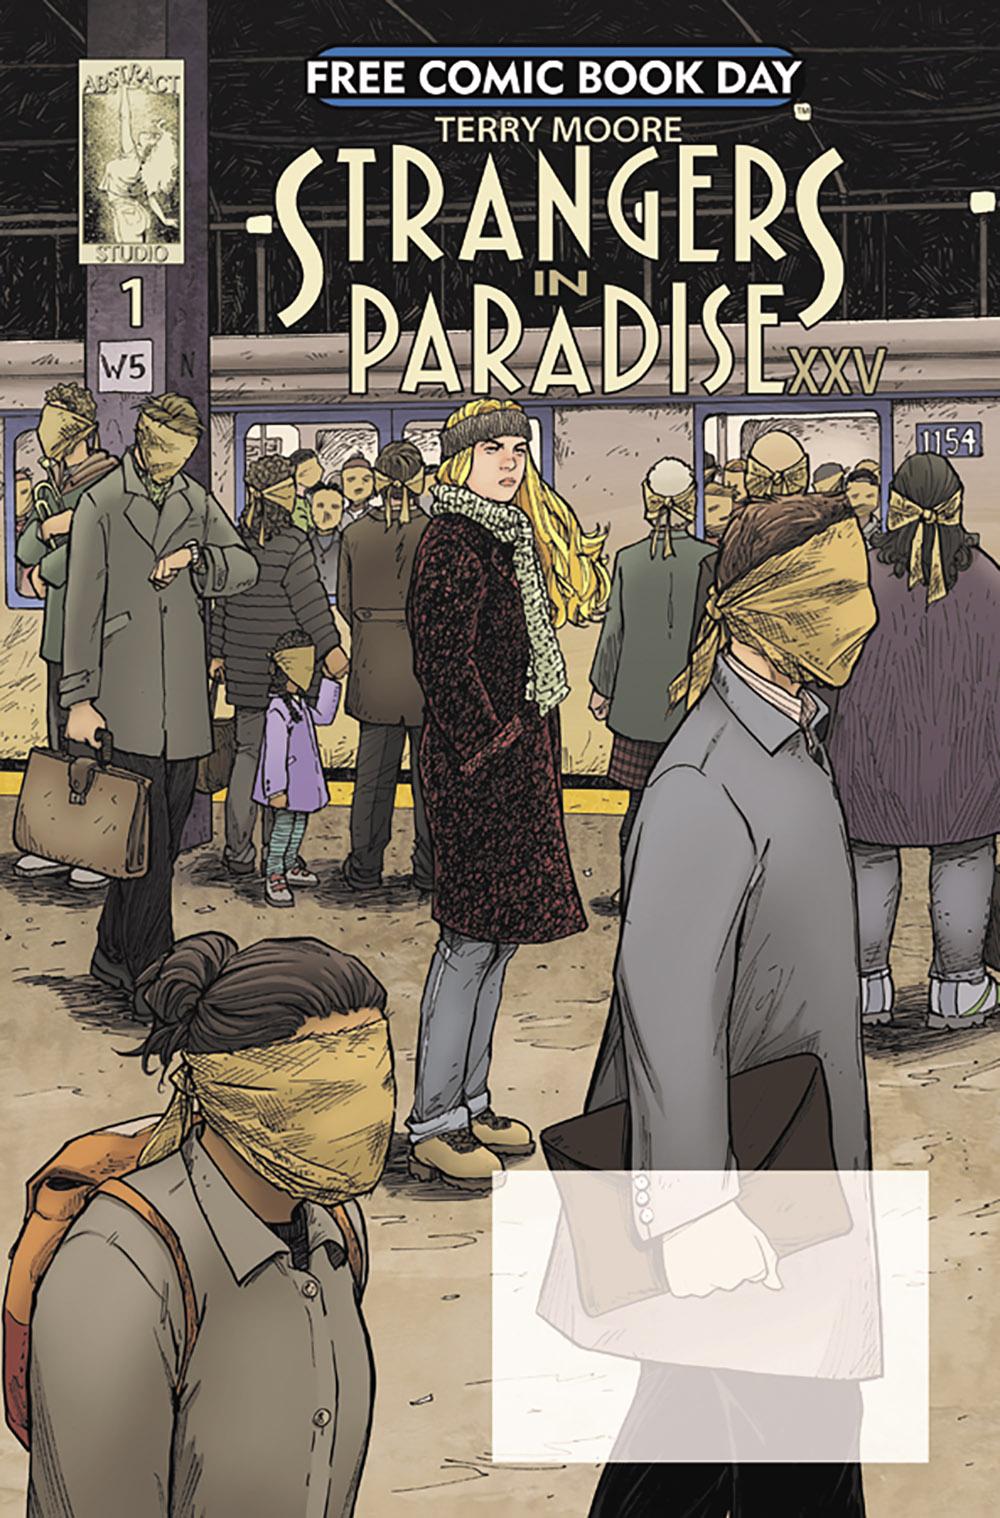 FCBD18_S_Abstract _Stranger In Paradise XXV #1.jpg